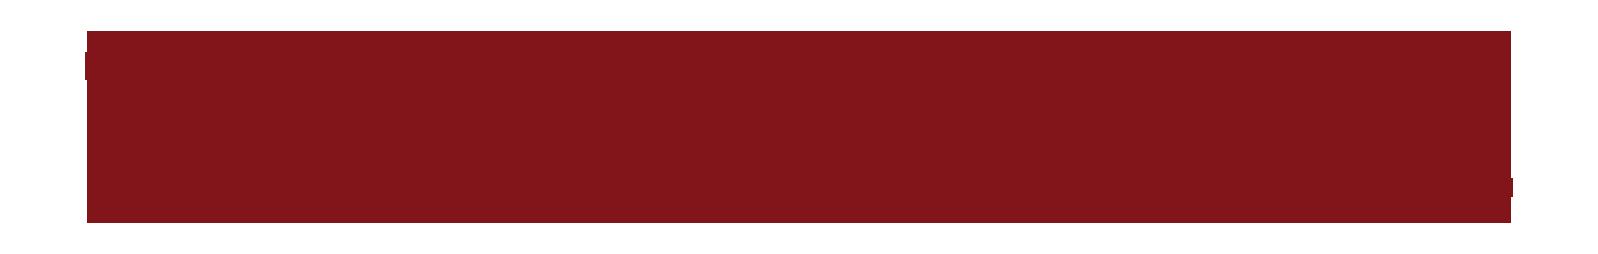 Logo edm 517d8bd68cd7047f46cb9552df2e0b7cf420cf639805194cfcfa4c1dbc77db72